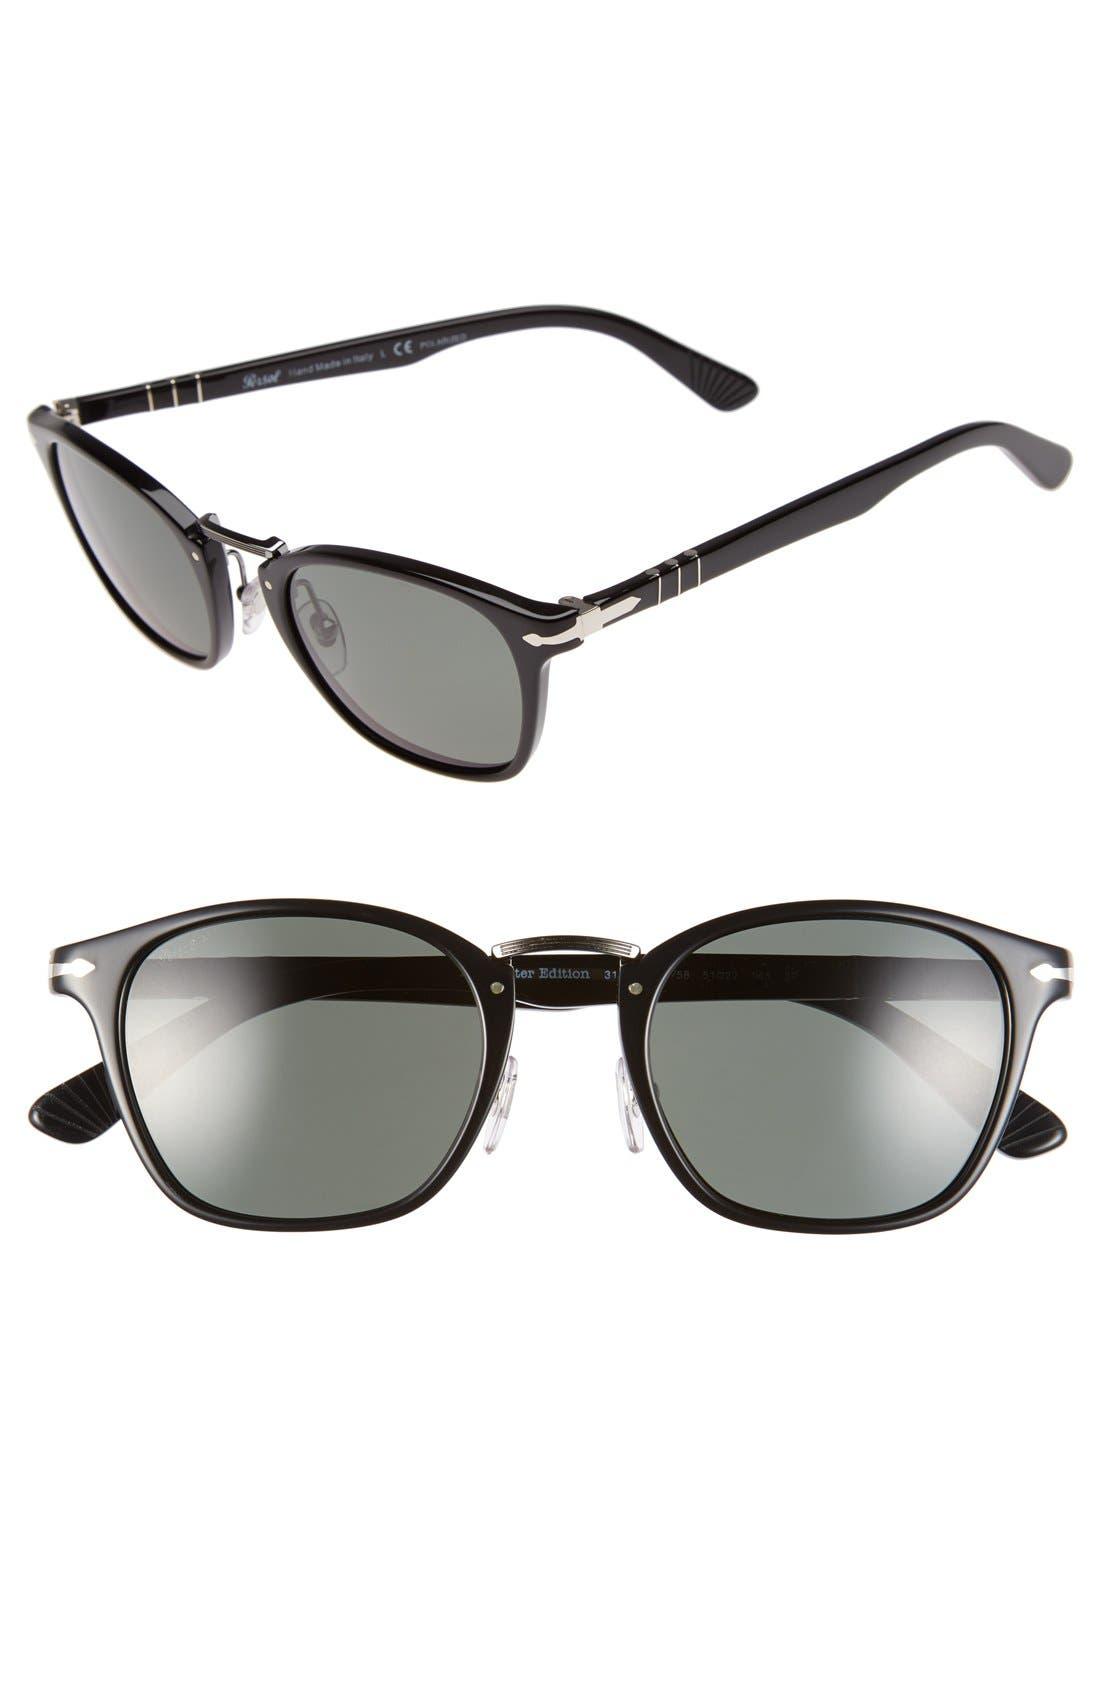 51mm Polarized Retro Sunglasses,                             Main thumbnail 1, color,                             Black/ Grey Green